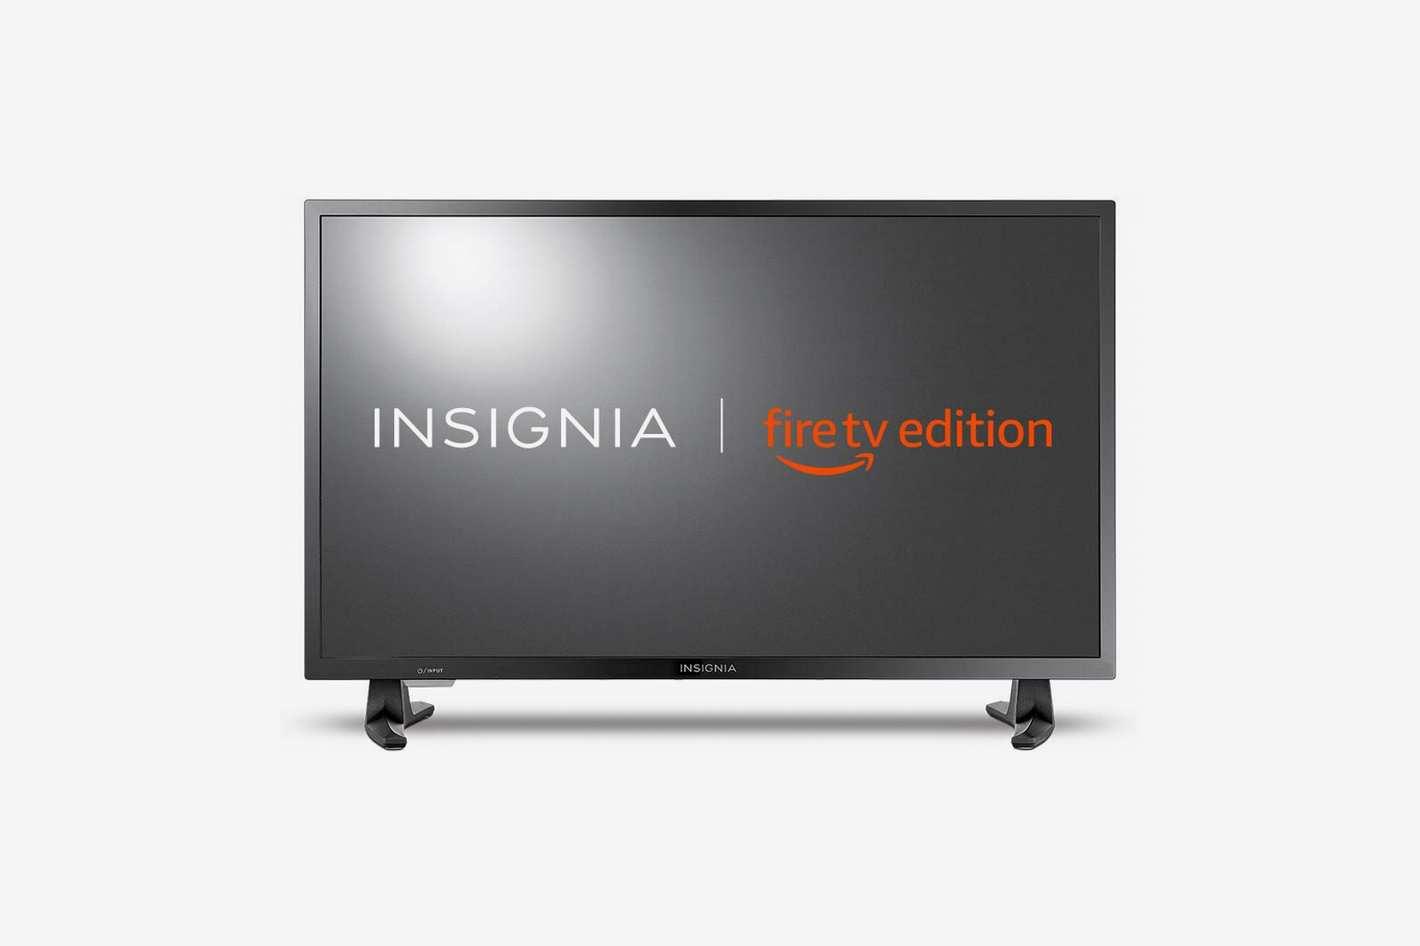 Insignia 32-inch 720p HD Smart LED TV- Fire TV Edition